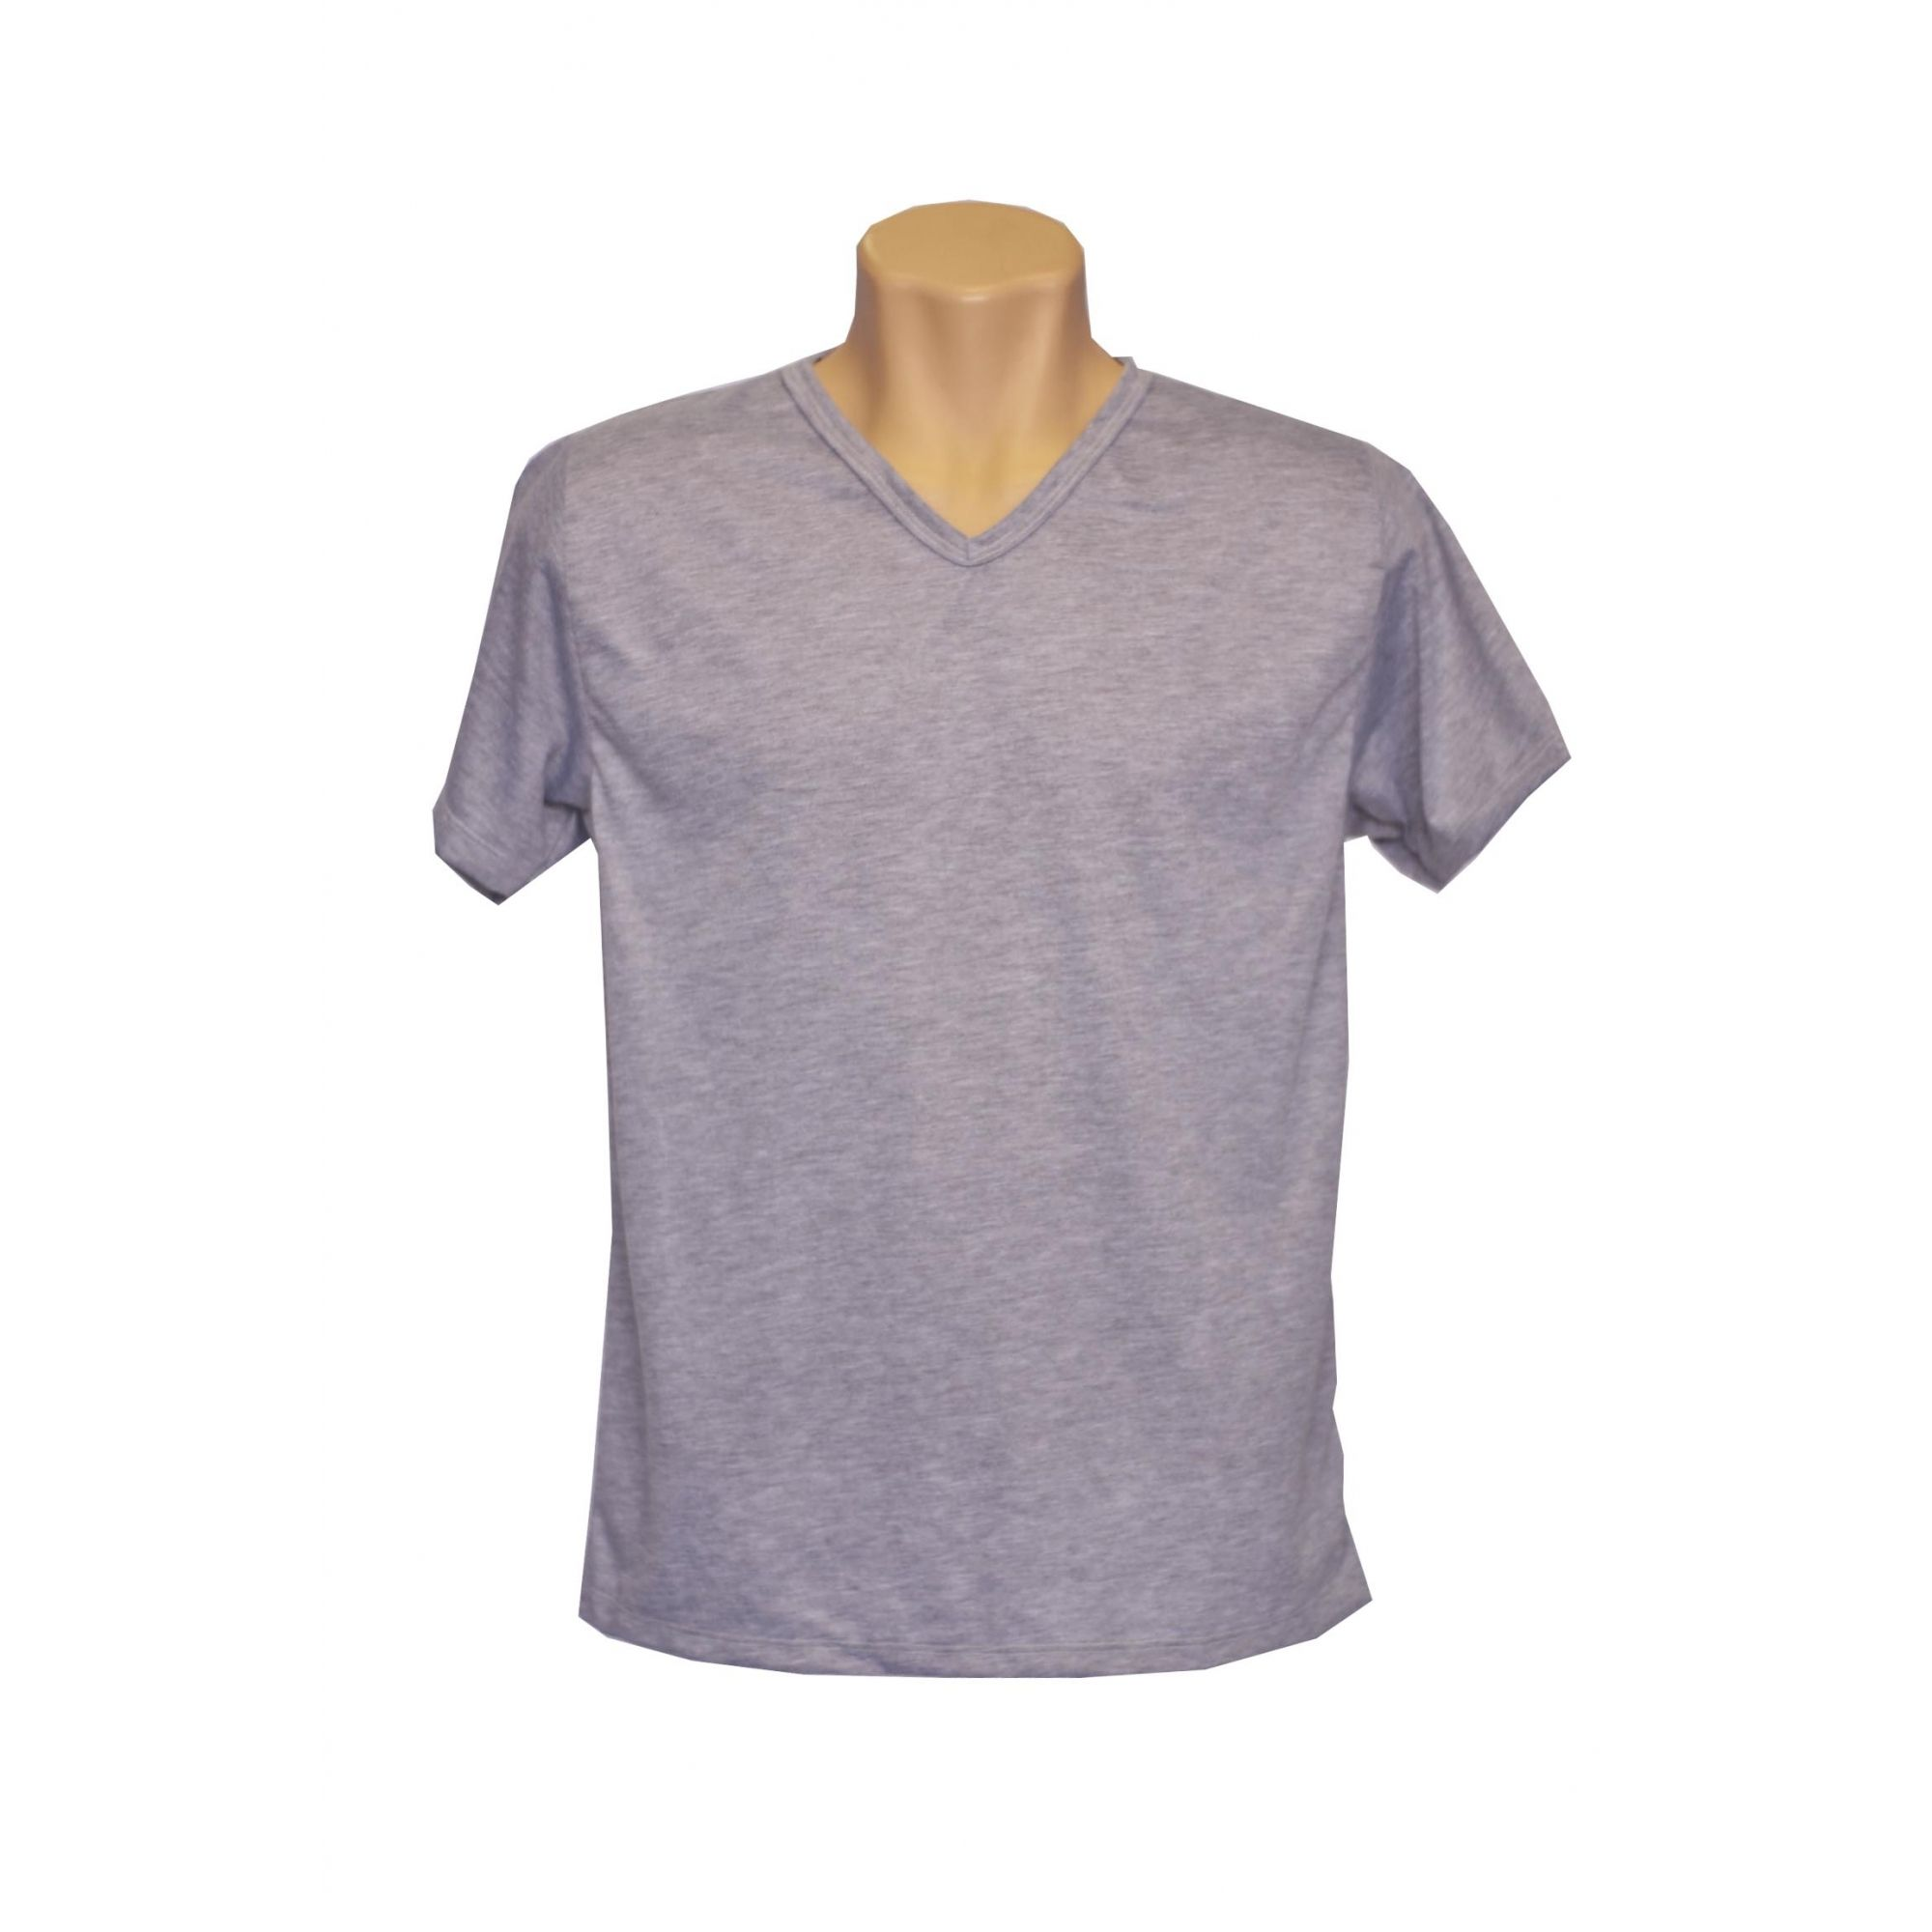 Camiseta adulta manga curta gola v cinza mescla